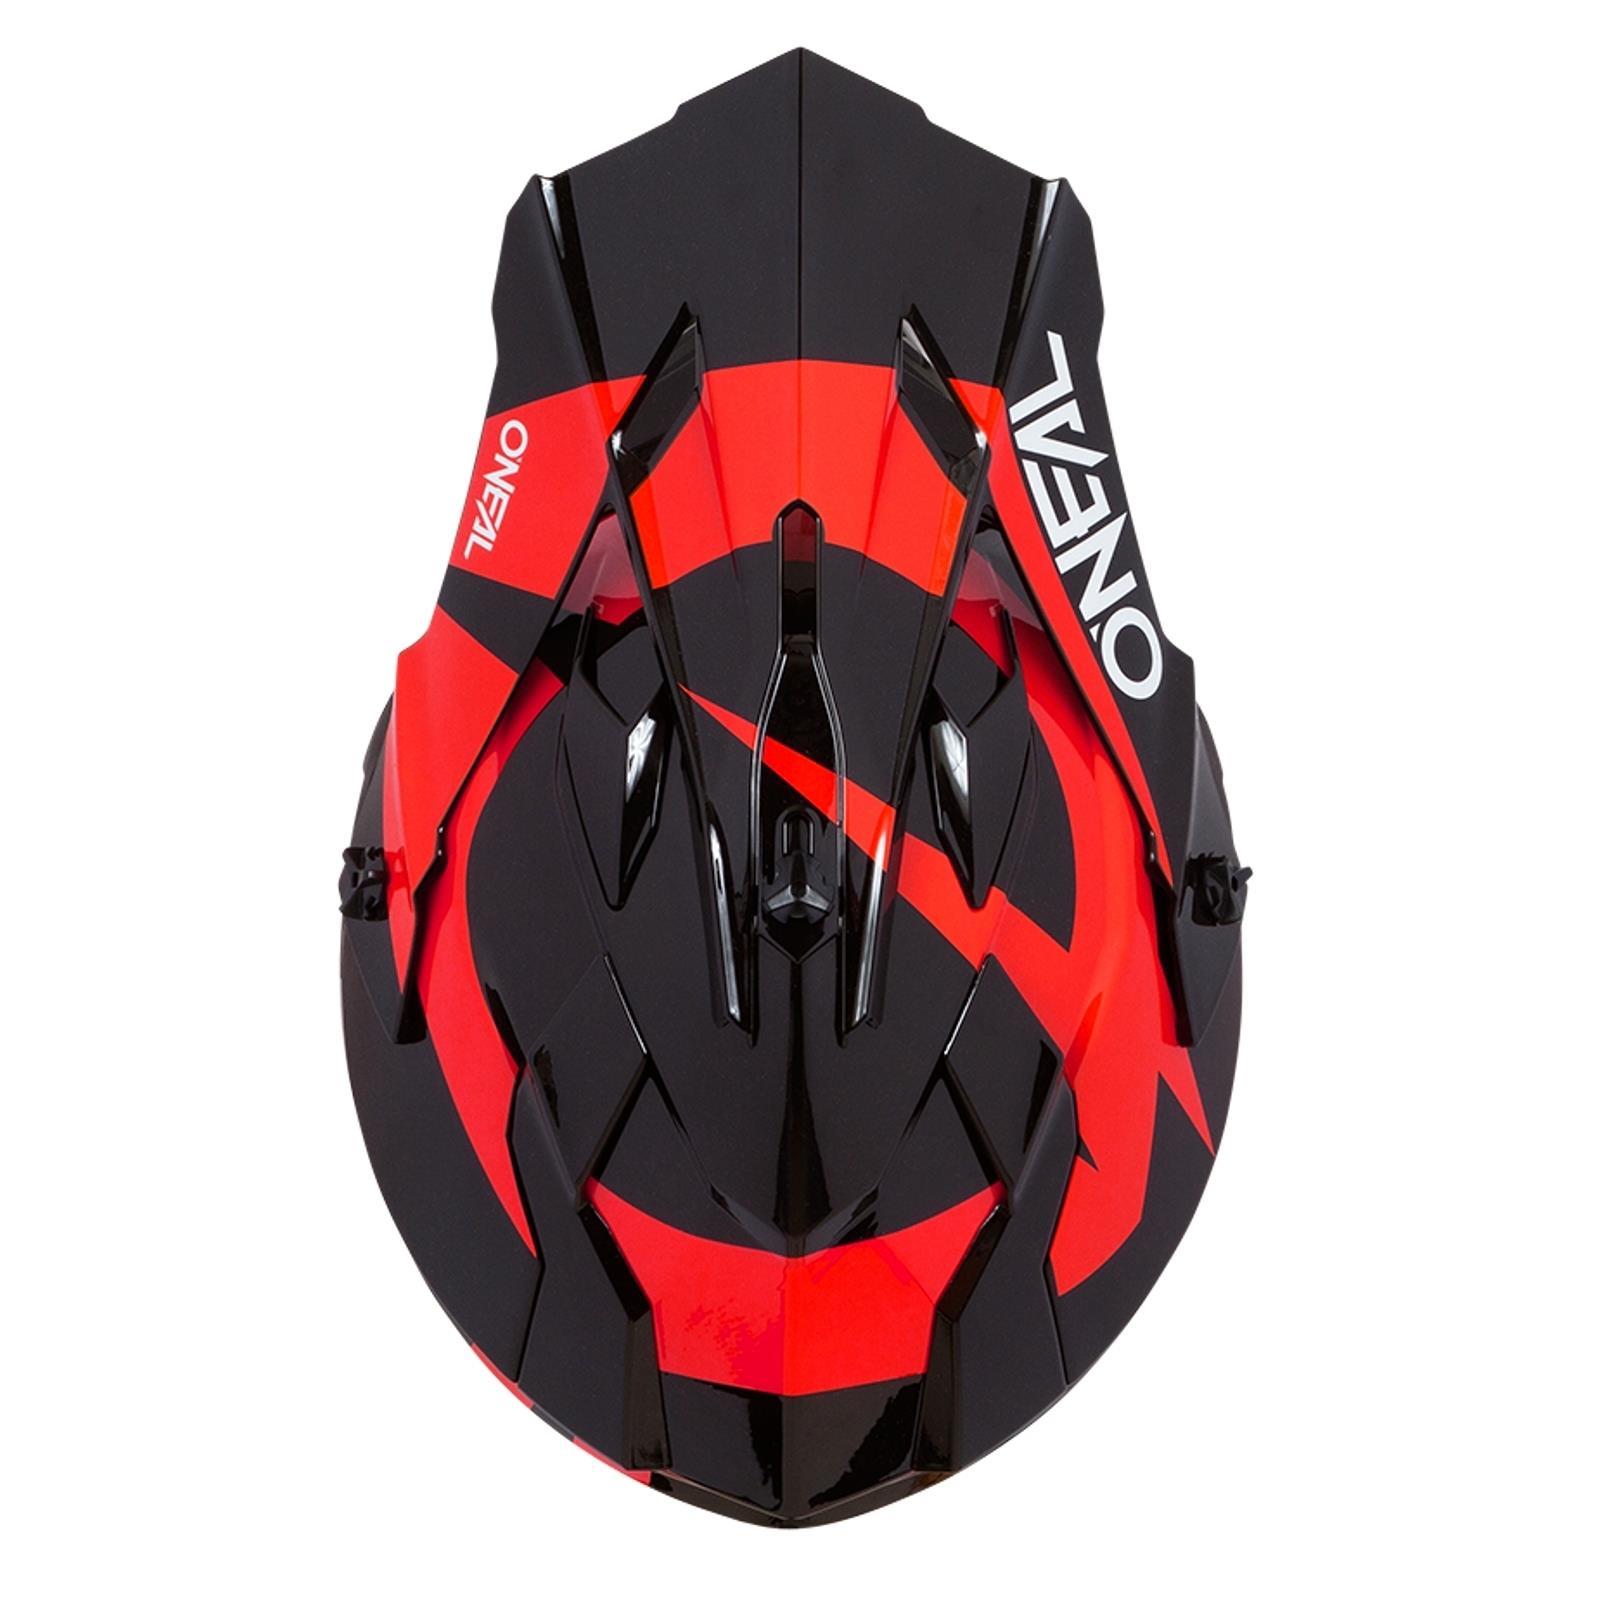 ONeal-Motocross-casco-MX-ENDURO-MOTO-BICI-FUORISTRADA-CROSS-Series-Adventure miniatura 16